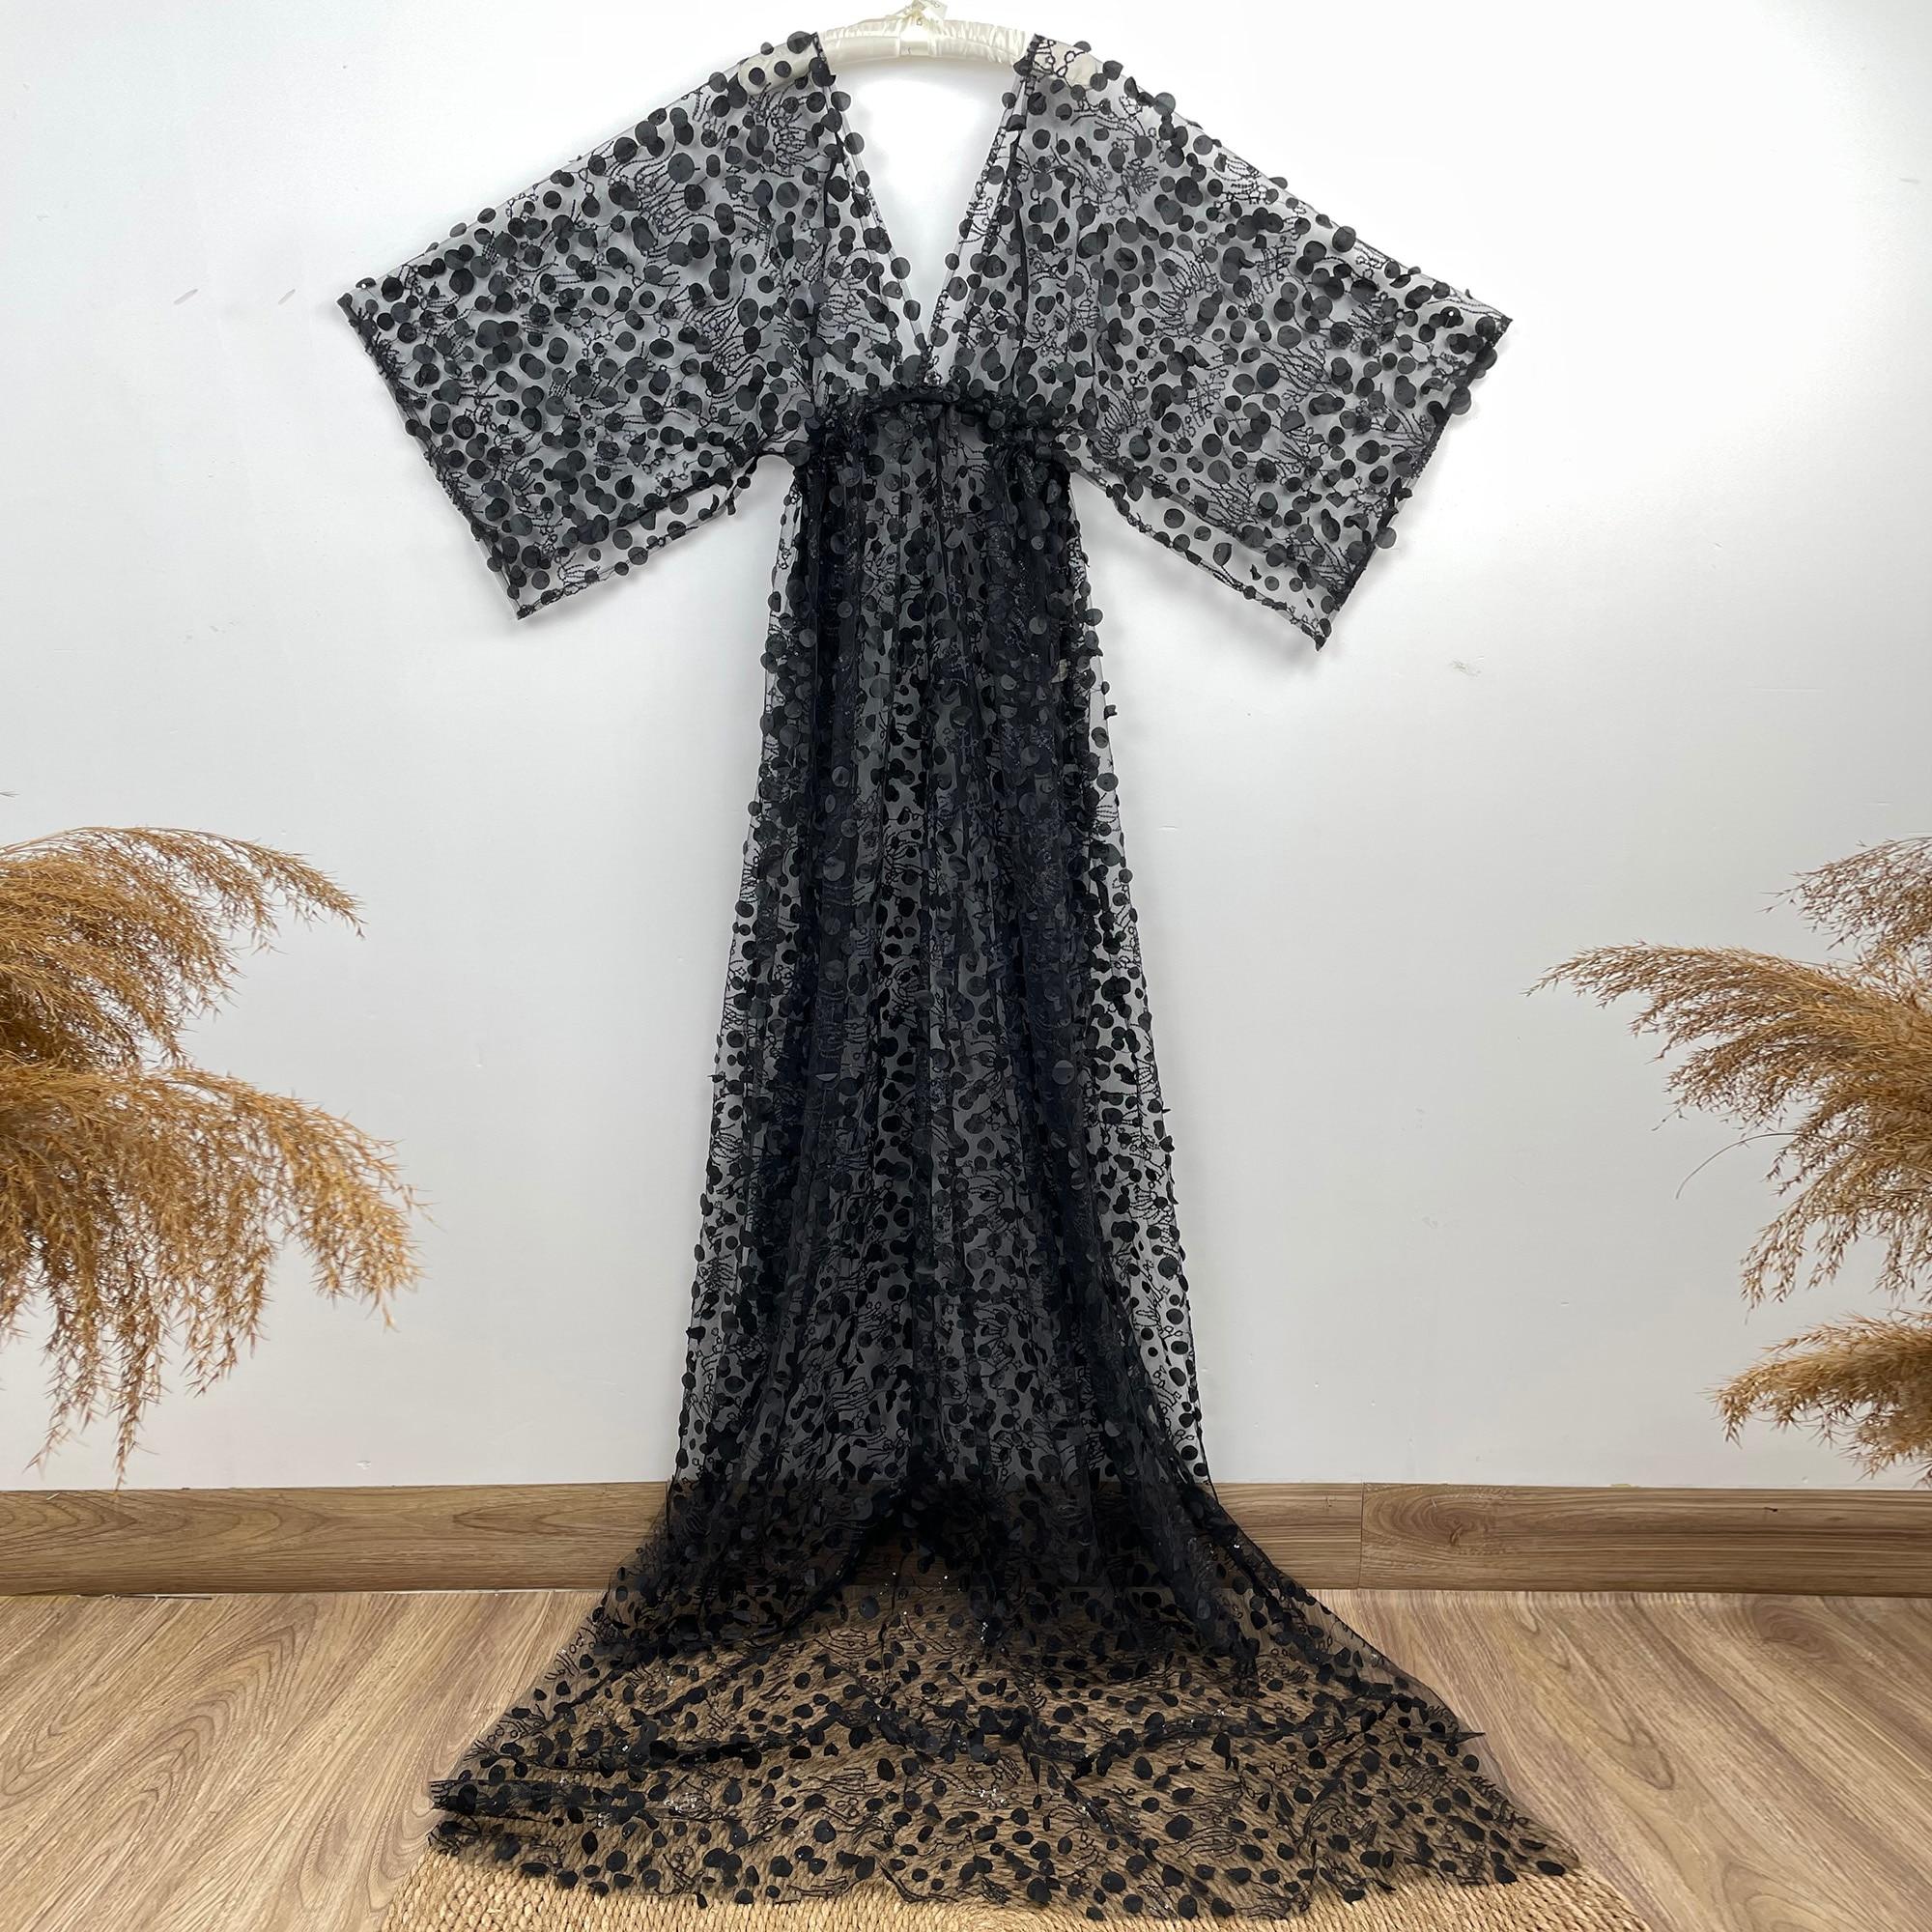 Don&Judy Black Women Photography Props Maternity Dresses Full Sleeves Pregnancy Sequin Long Dress Studio Shoot Photo Props 2021